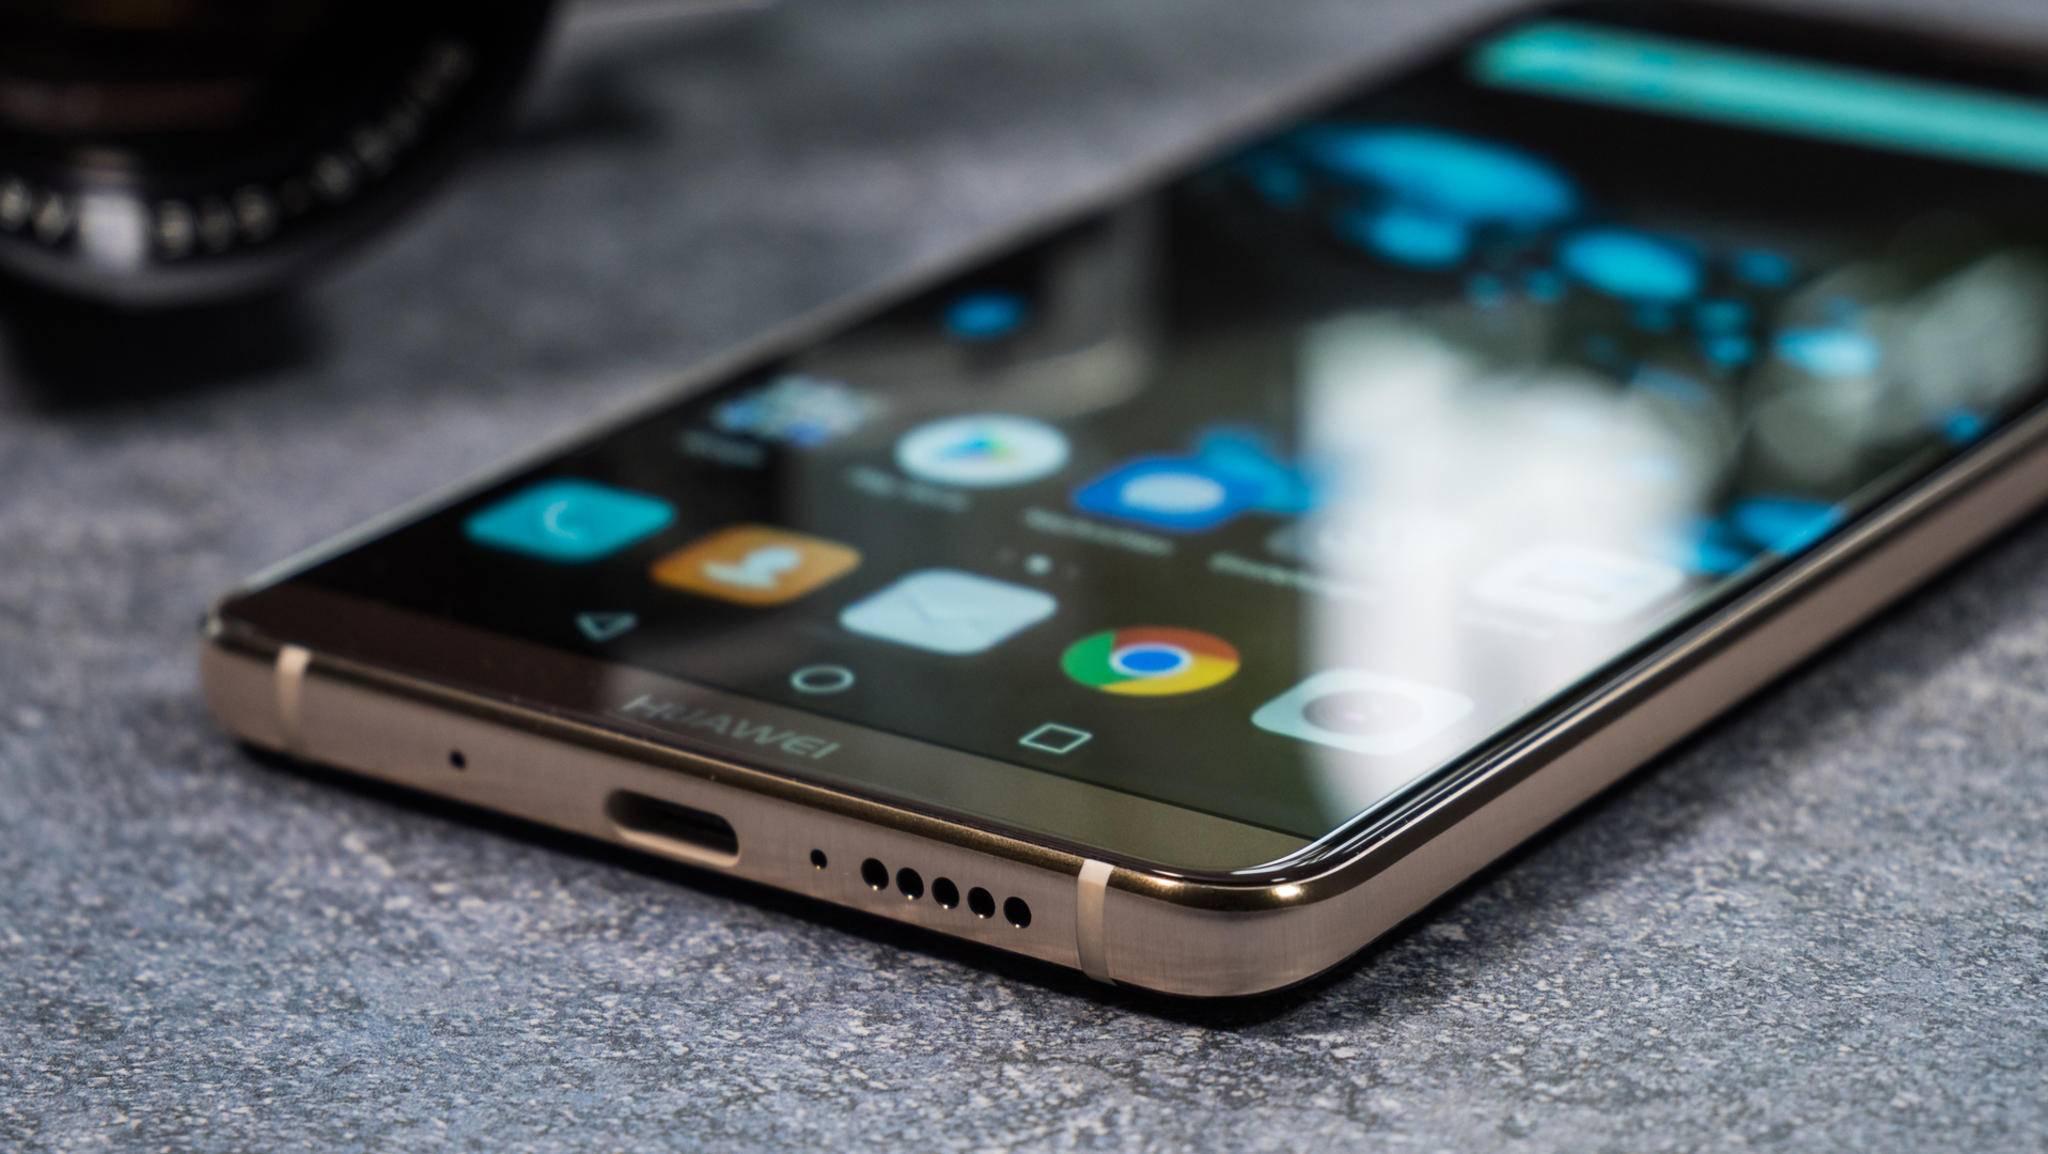 Bekommt der Nachfolger des Mate 10 Pro einen Ultraschall-Fingerabdruckscanner?